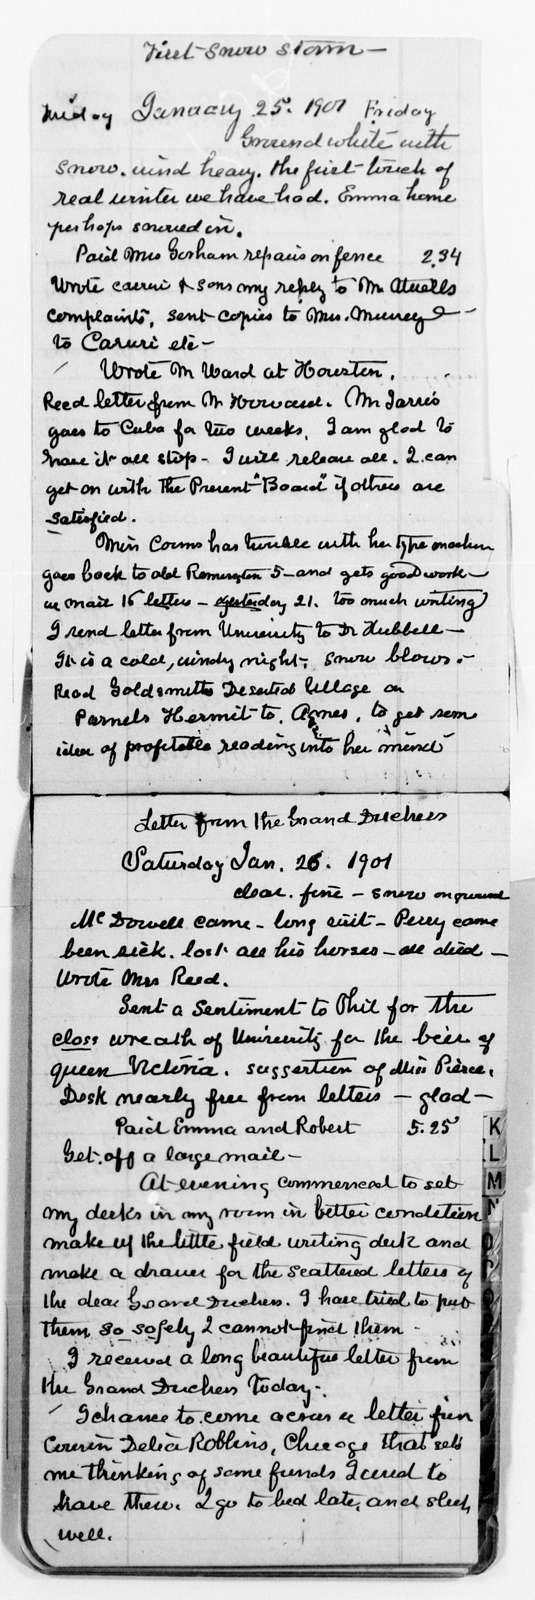 Clara Barton Papers: Diaries and Journals: 1899, Nov. 11-24; 1900, Dec. 12-1901, Mar. 31